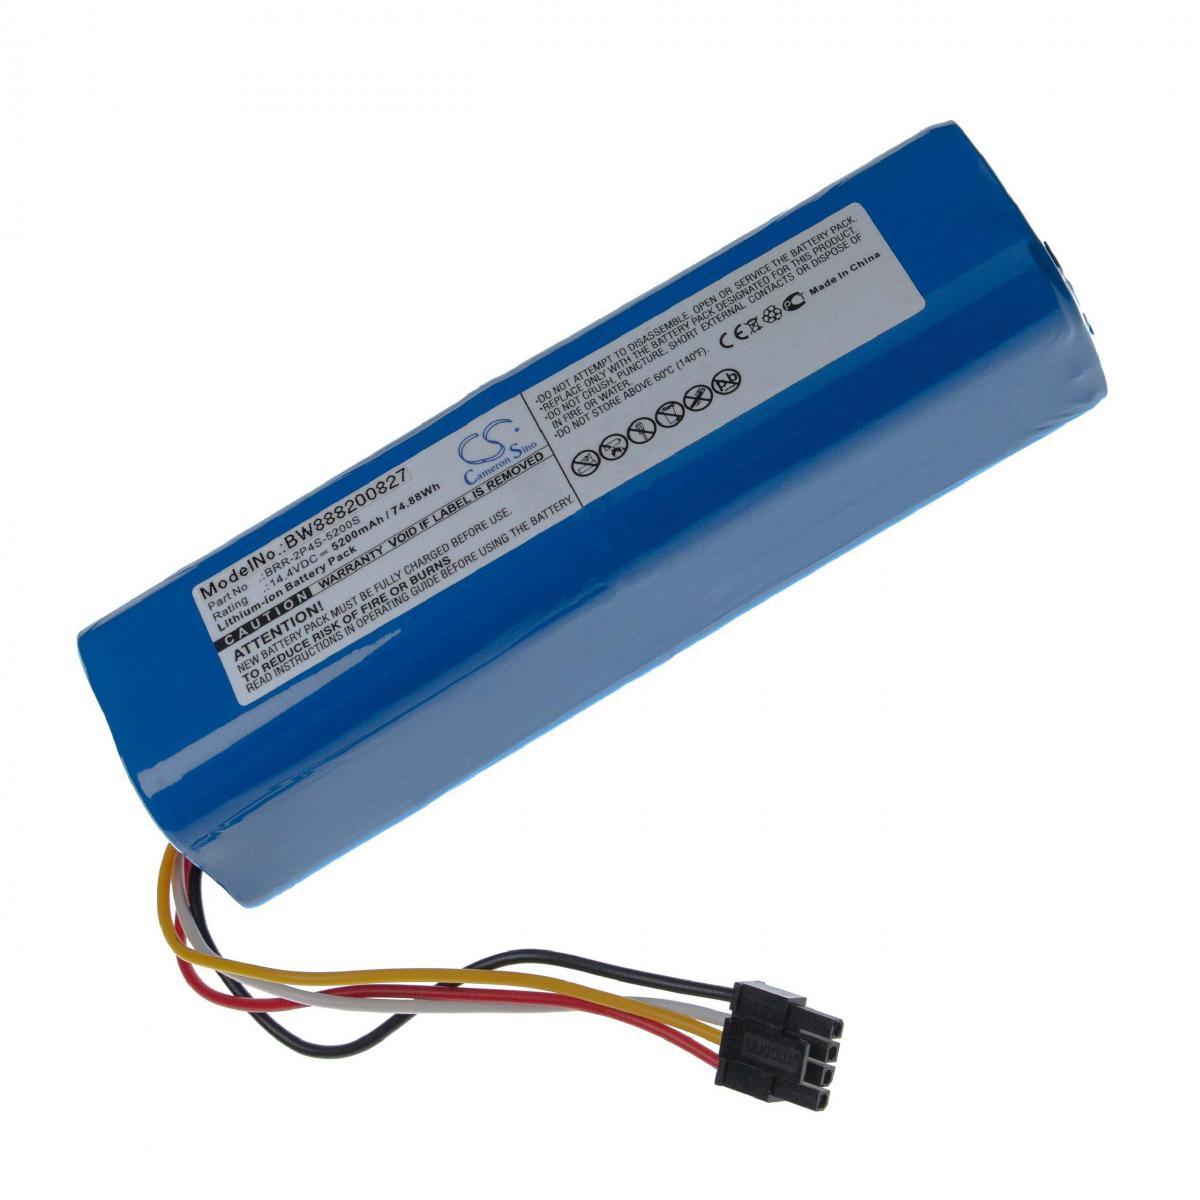 Vhbw vhbw batterie compatible avec Xiaomi Mi Robo, Mijia Roborock S50, Mijia Roborock S51, Millet Sweeper Home Cleaner (5200m